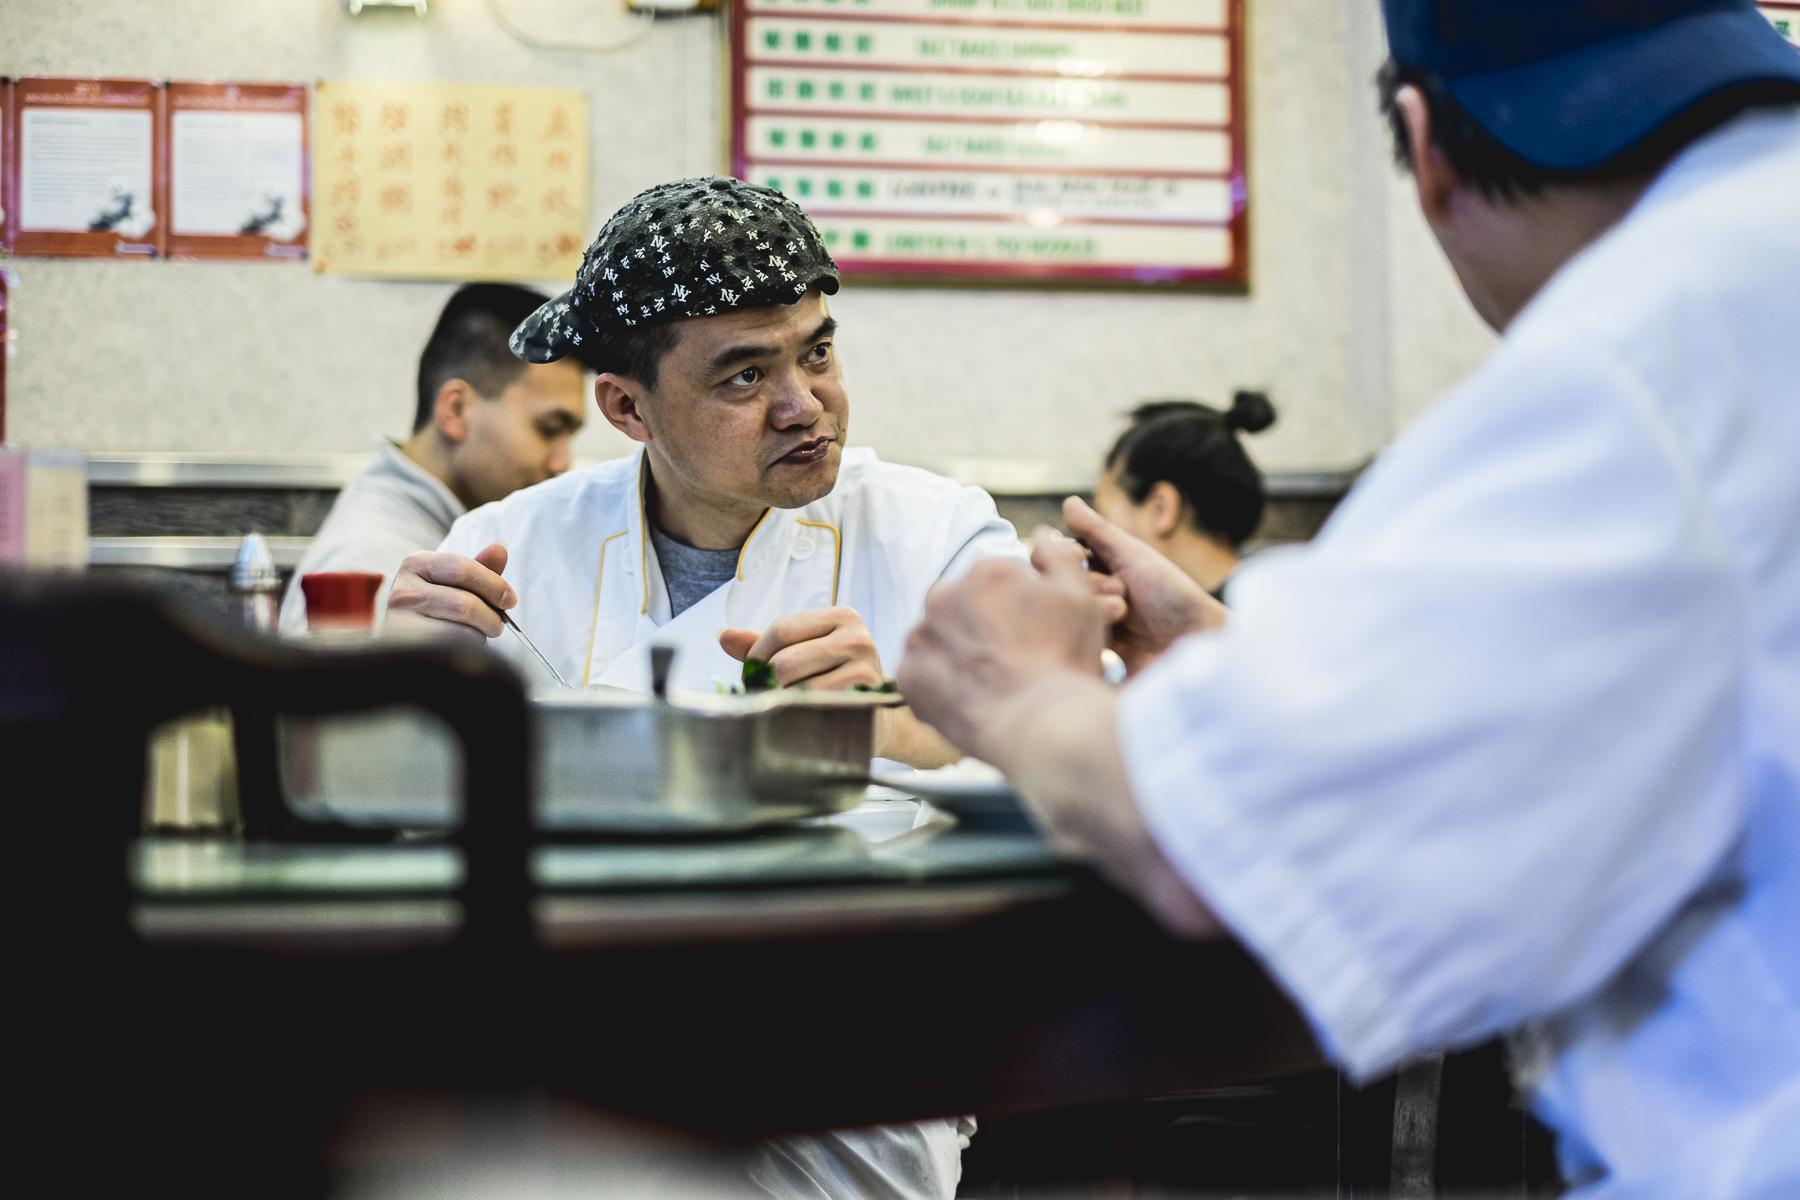 Restaurante Streetphotography New York / Zaragoza Walkers